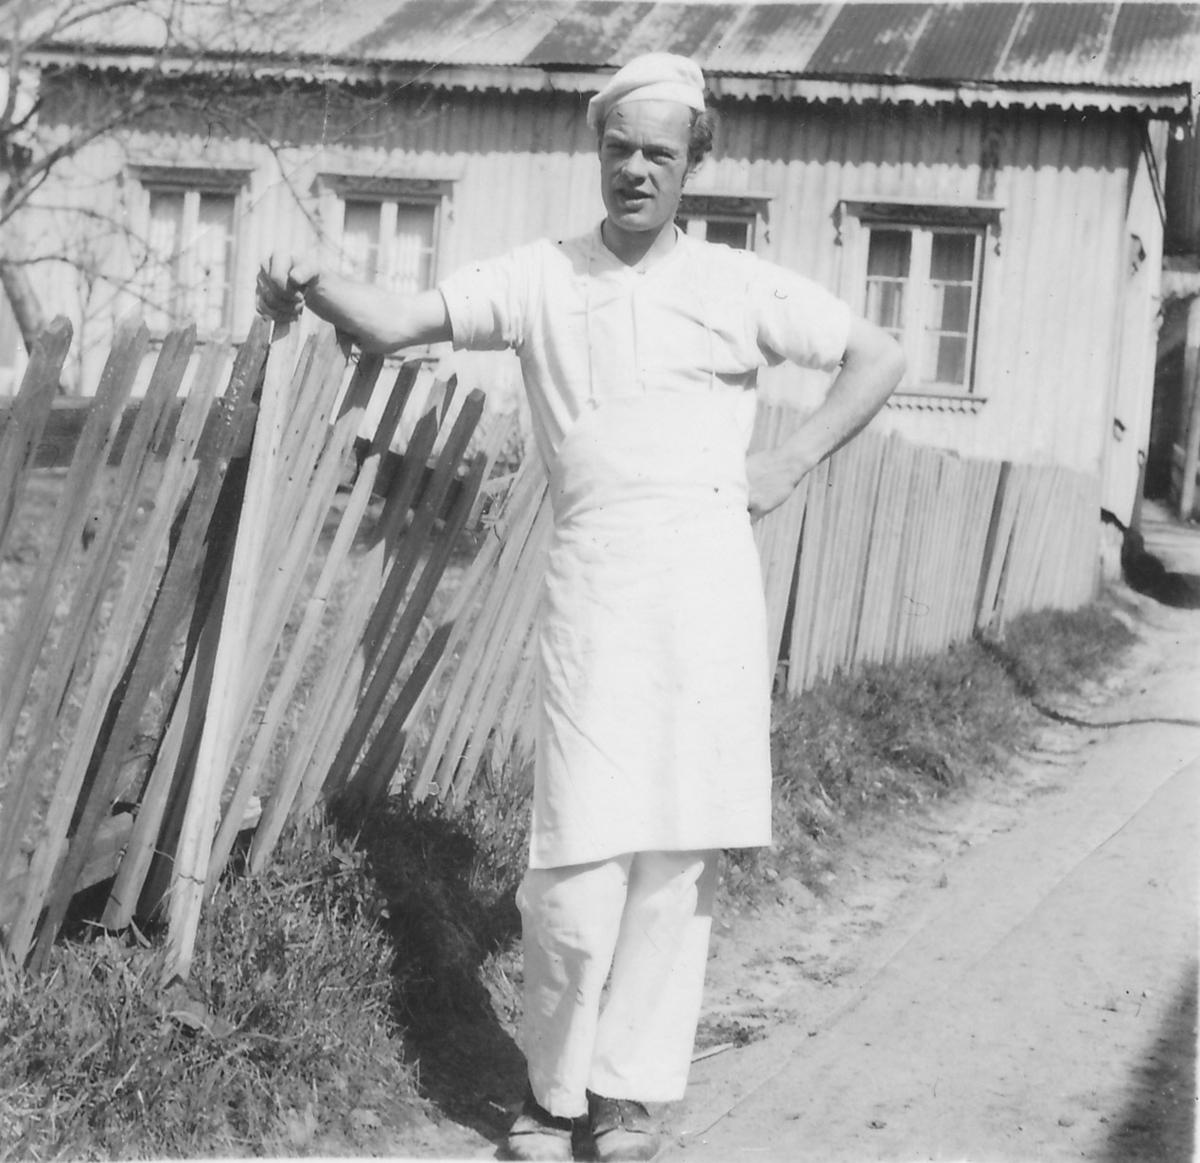 Bakarsvein Olav J. Landvik